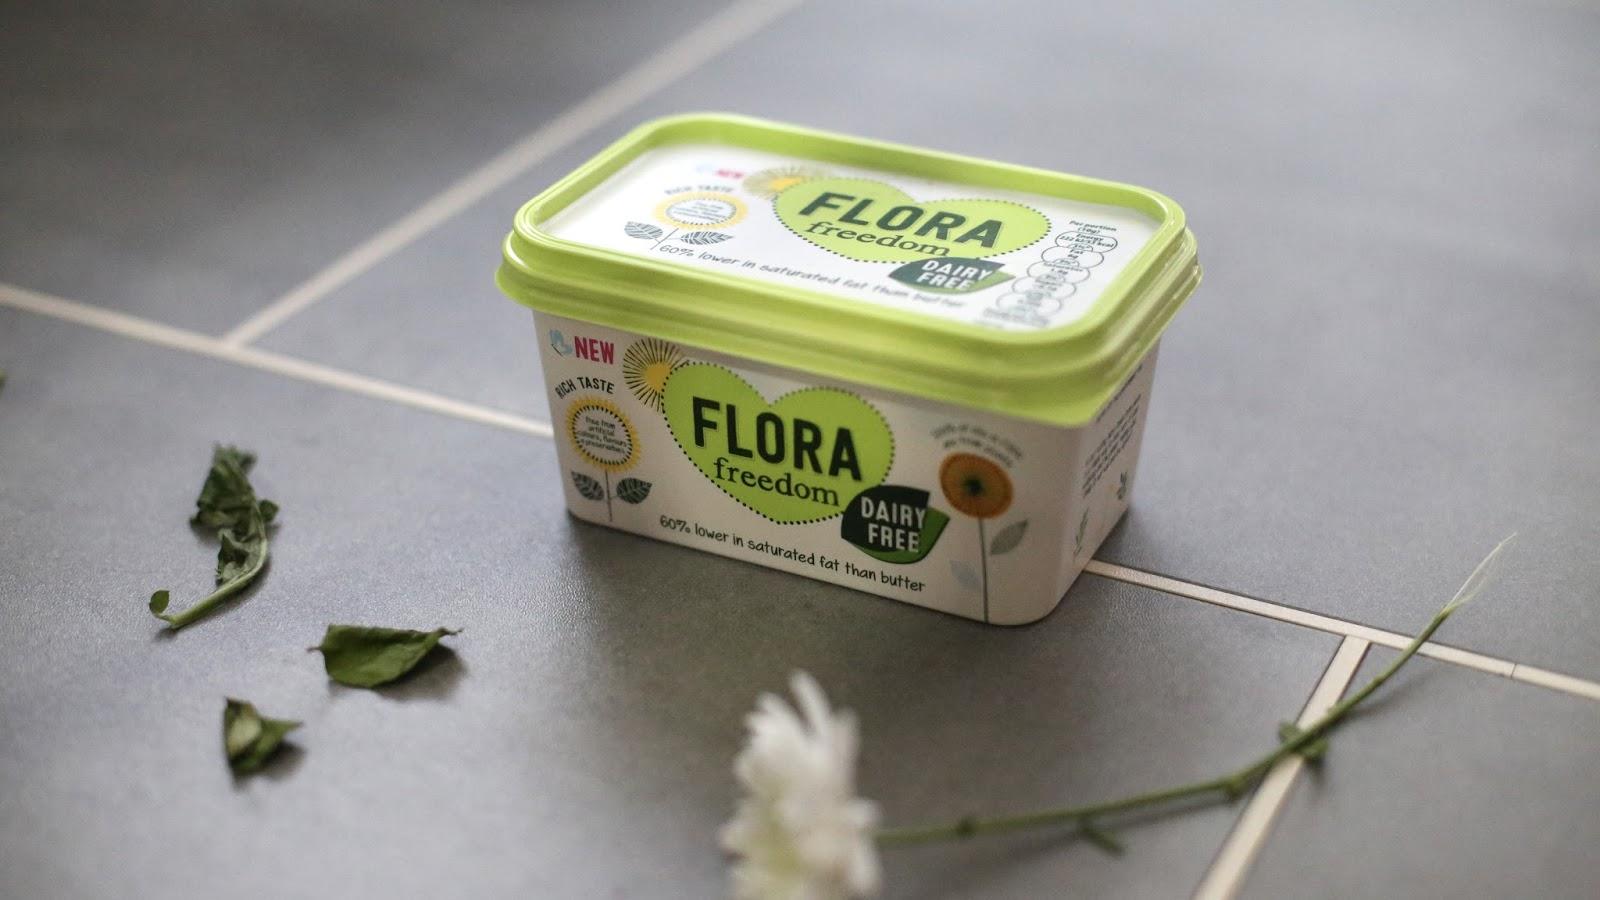 flora freedom